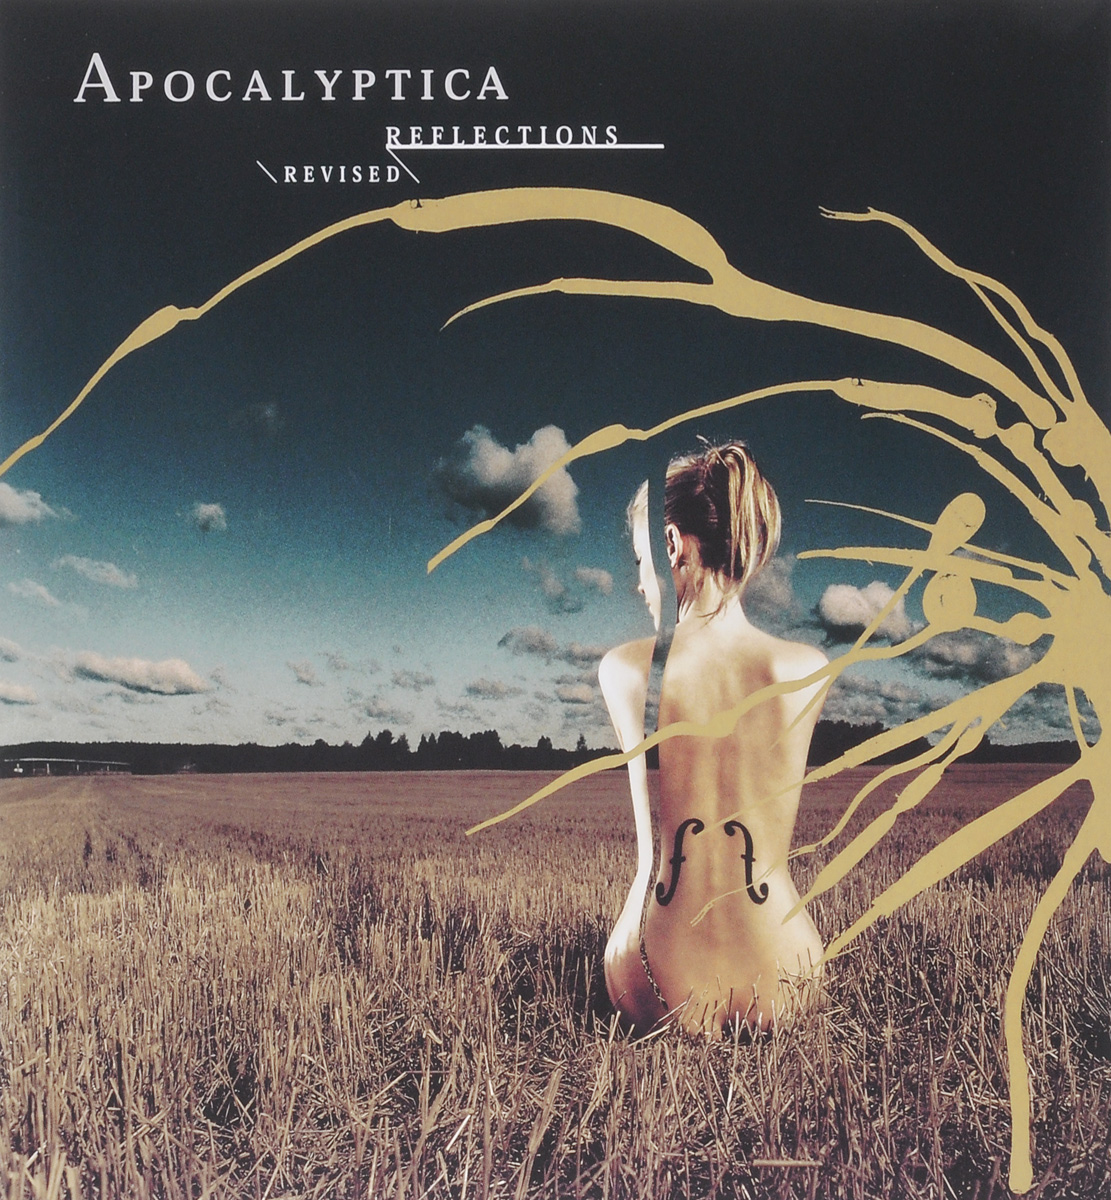 Apocalyptica Apocalyptica. Reflections / Revised (2 LP + CD) apocalyptica apocalyptica shadowmaker 2 lp cd